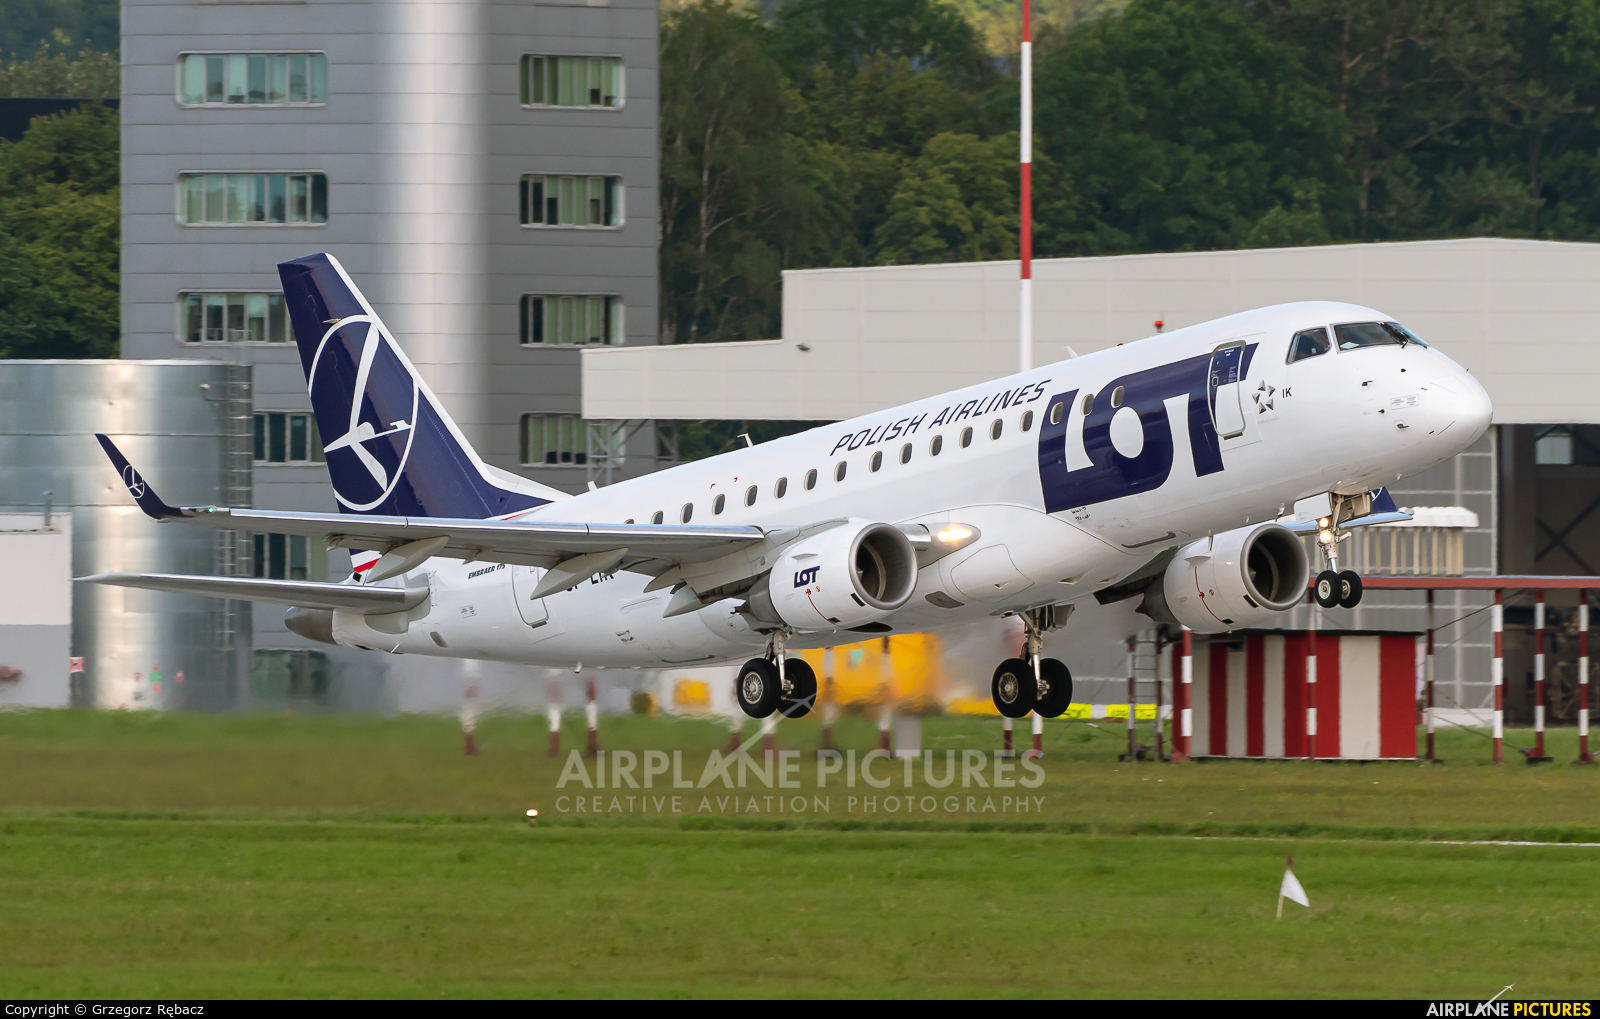 LOT - Polish Airlines SP-LIK aircraft at Kraków - John Paul II Intl